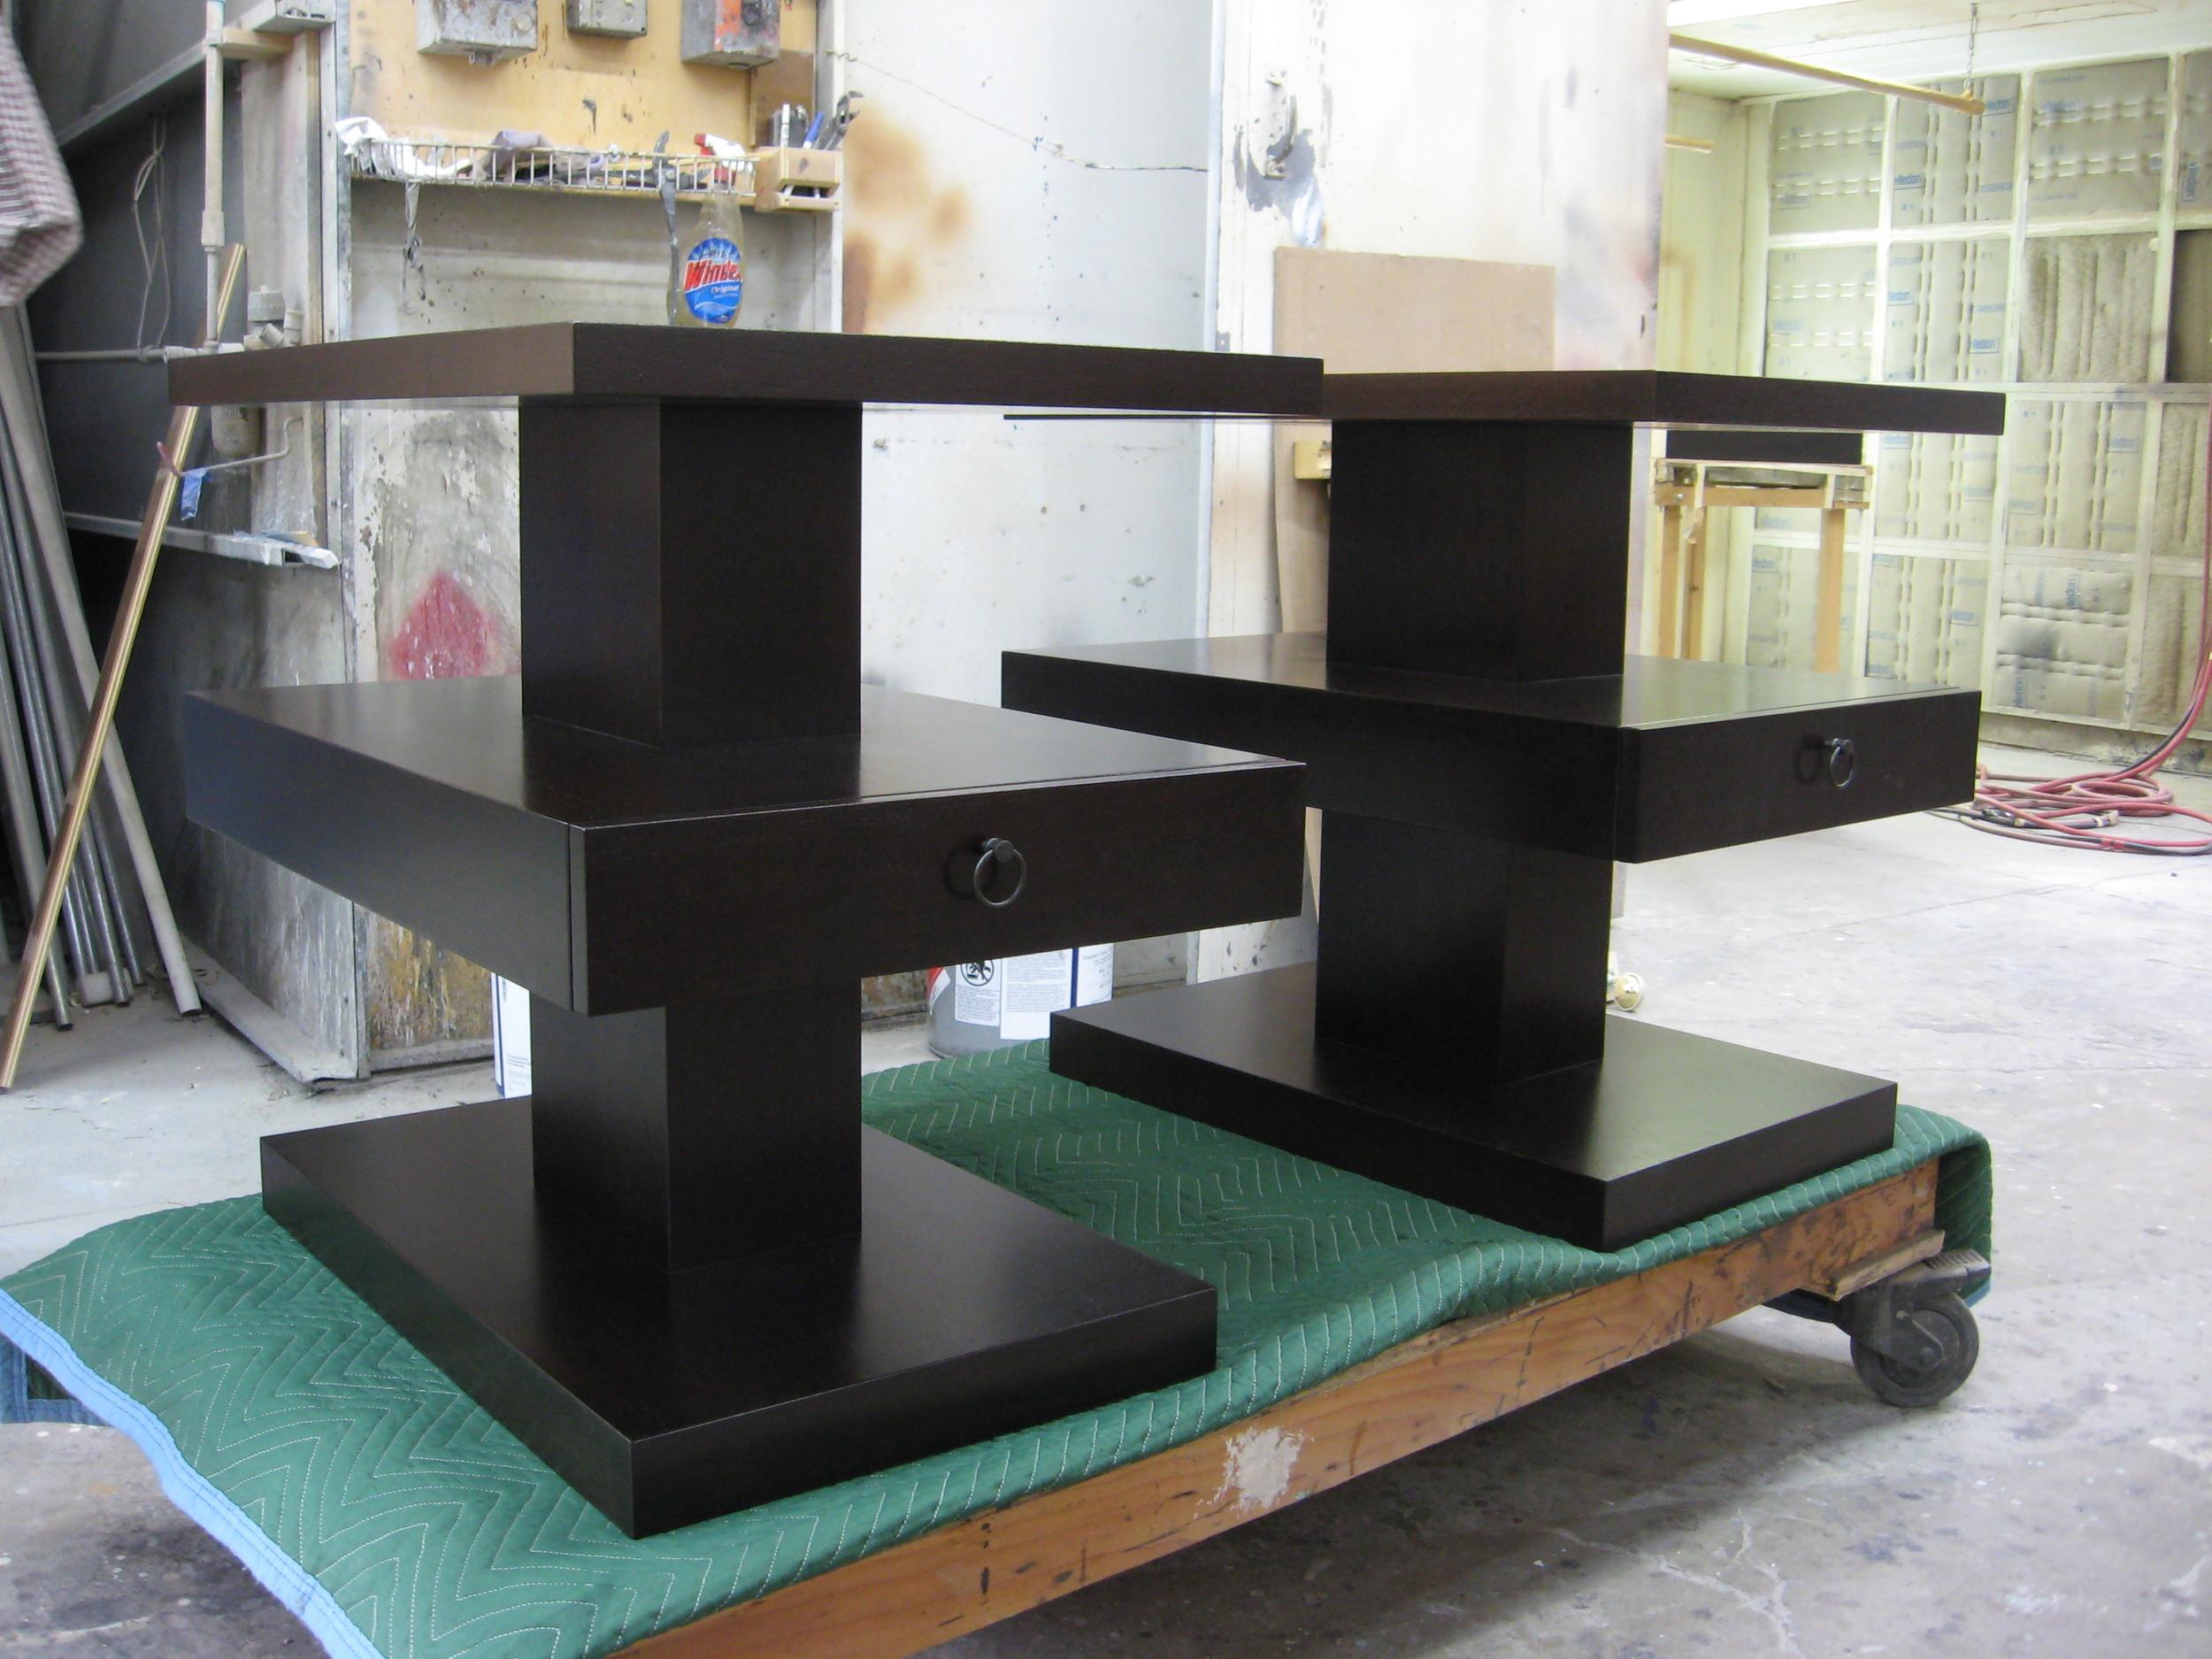 three-tiered nightstands